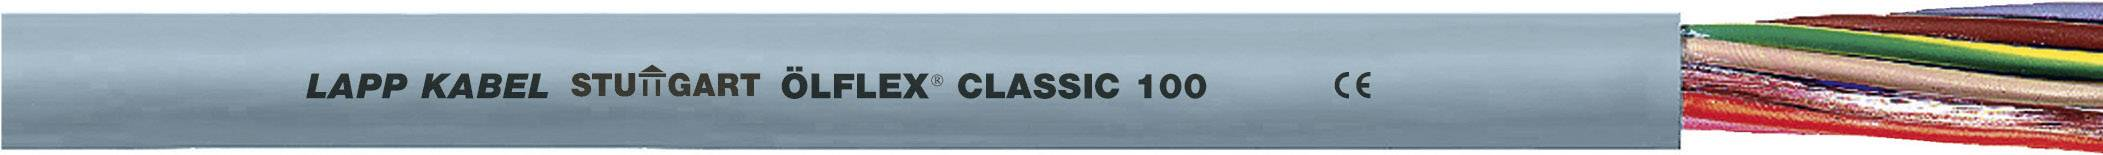 Kabel LappKabel Ölflex CLASSIC 100 3G0,75 (00100224), PVC, 5,7 mm, 750 V, šedá, 50 m